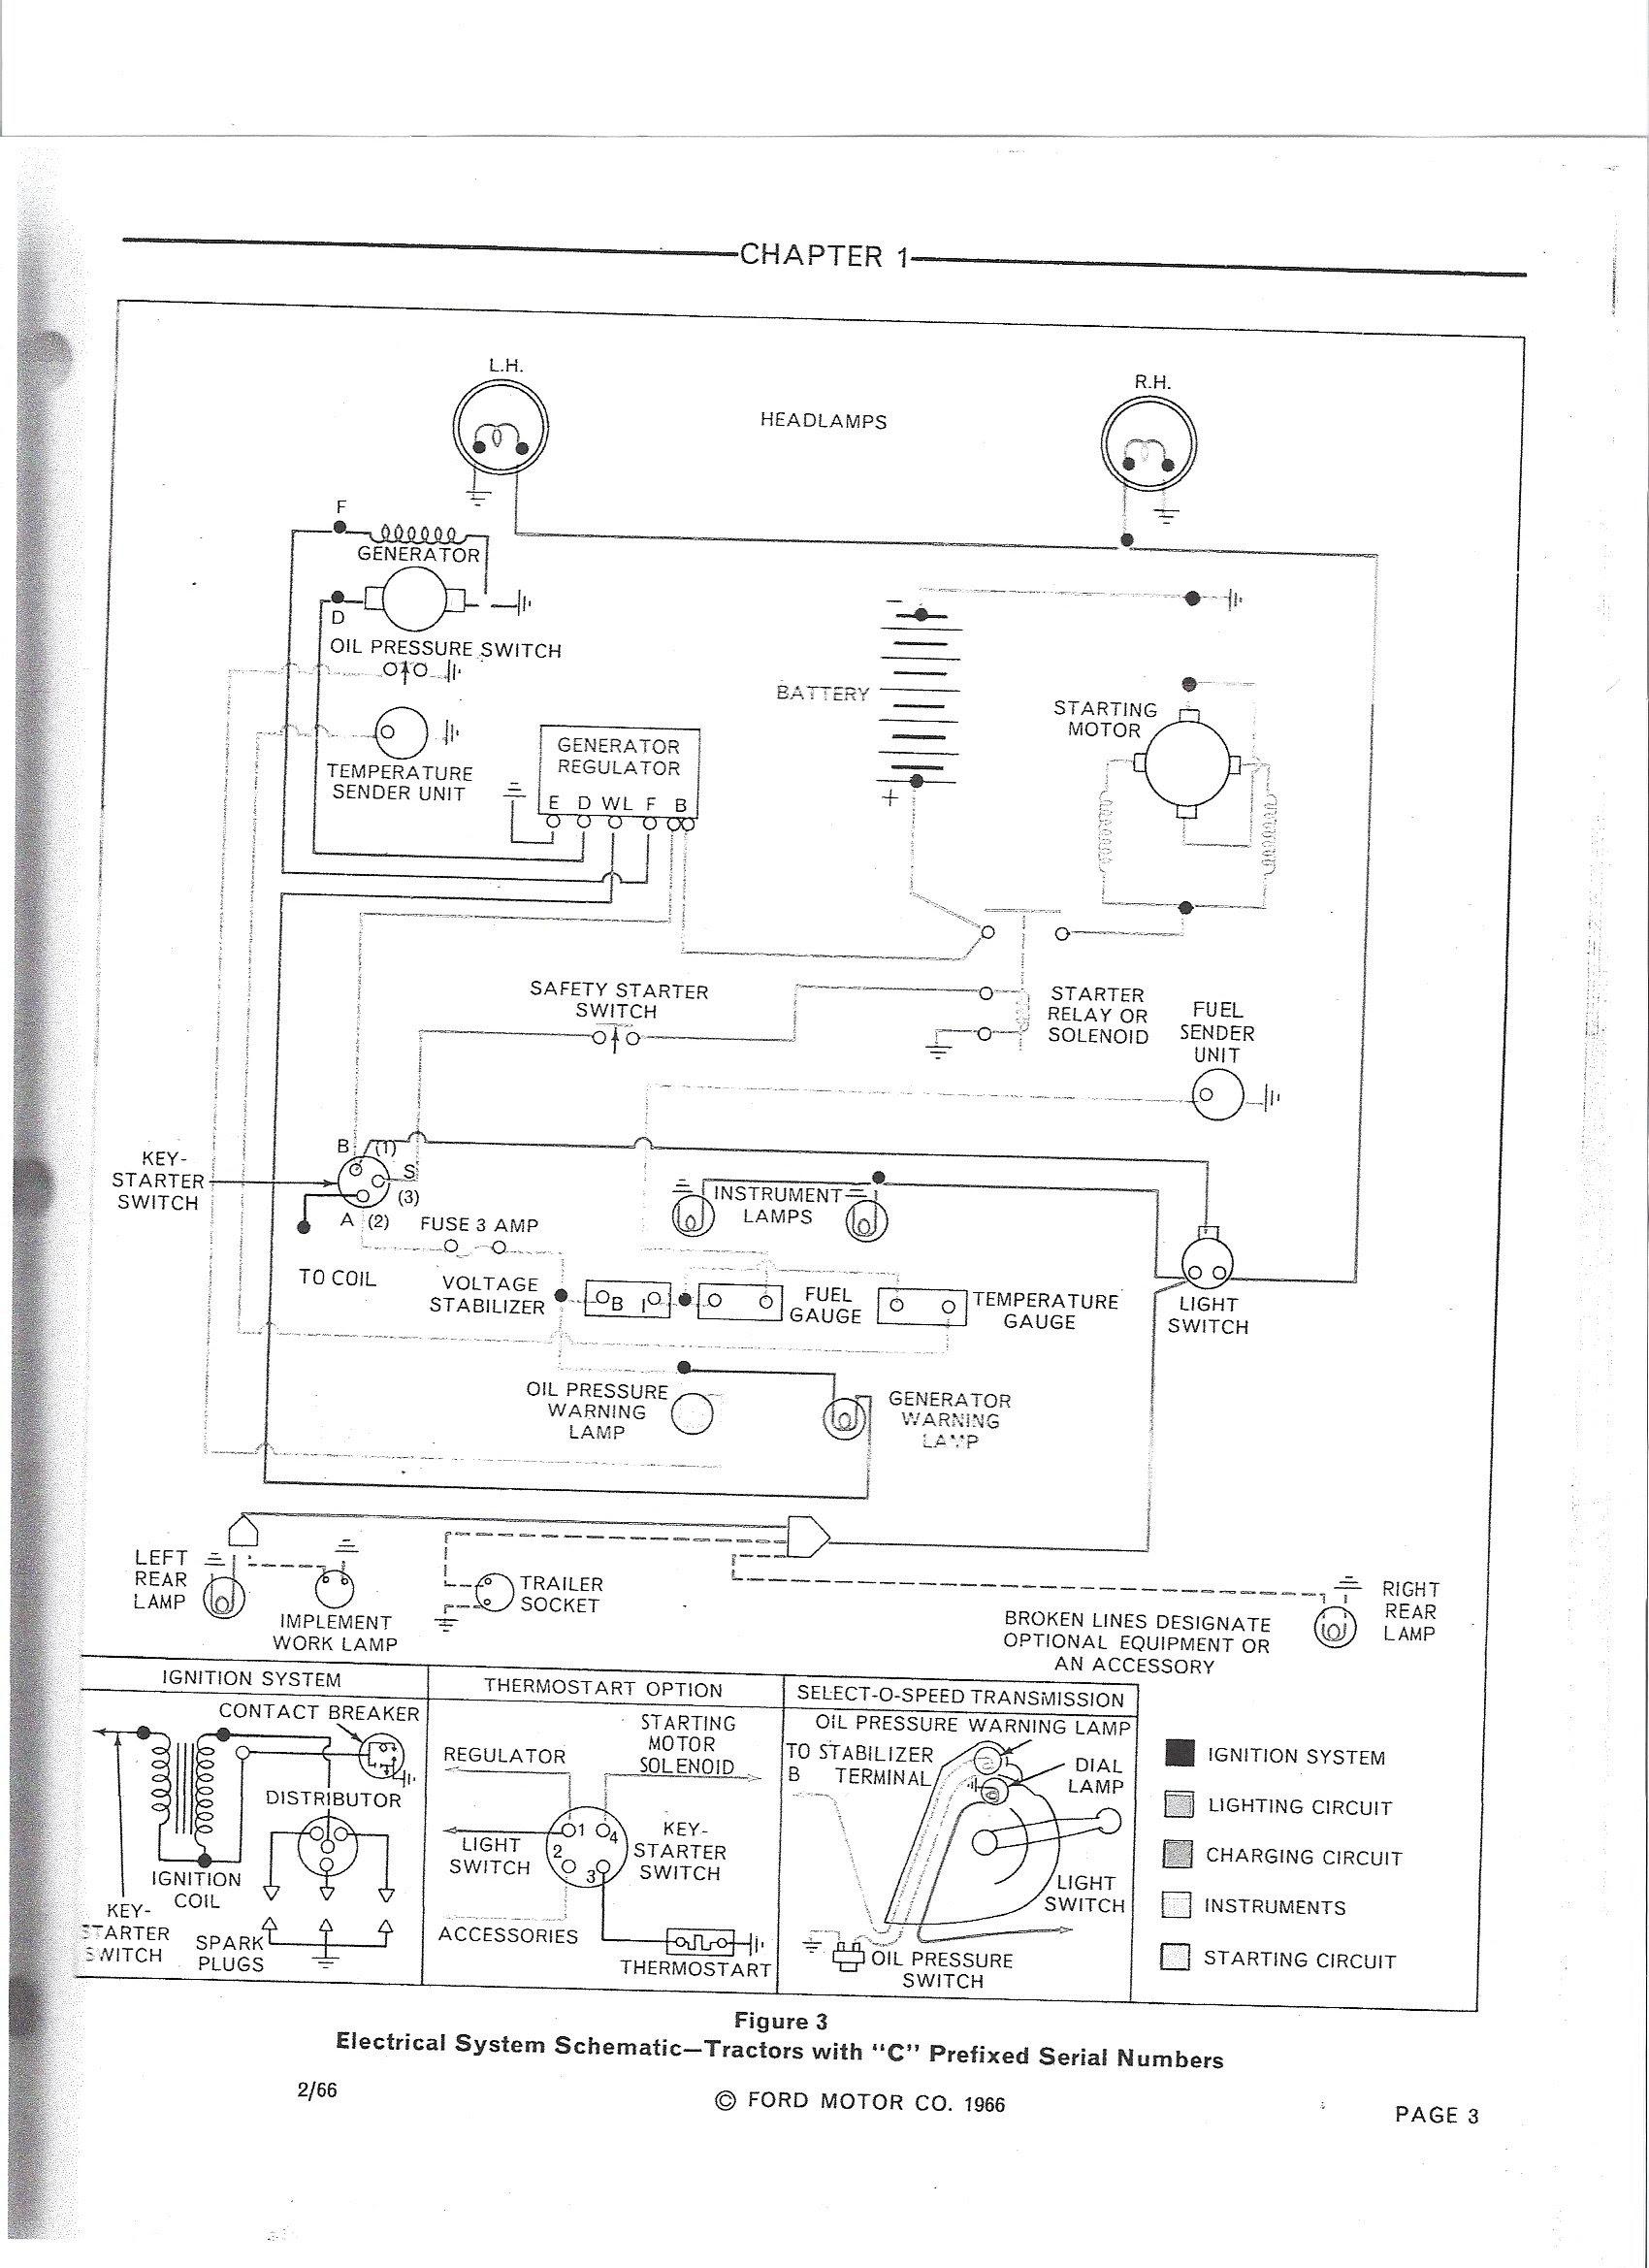 1971 Ford Ln600 Wiring Diagram Wiring Diagram Type 924 S Model 87 Sheet Porsche 944 Electrics Bege Wiring Diagram